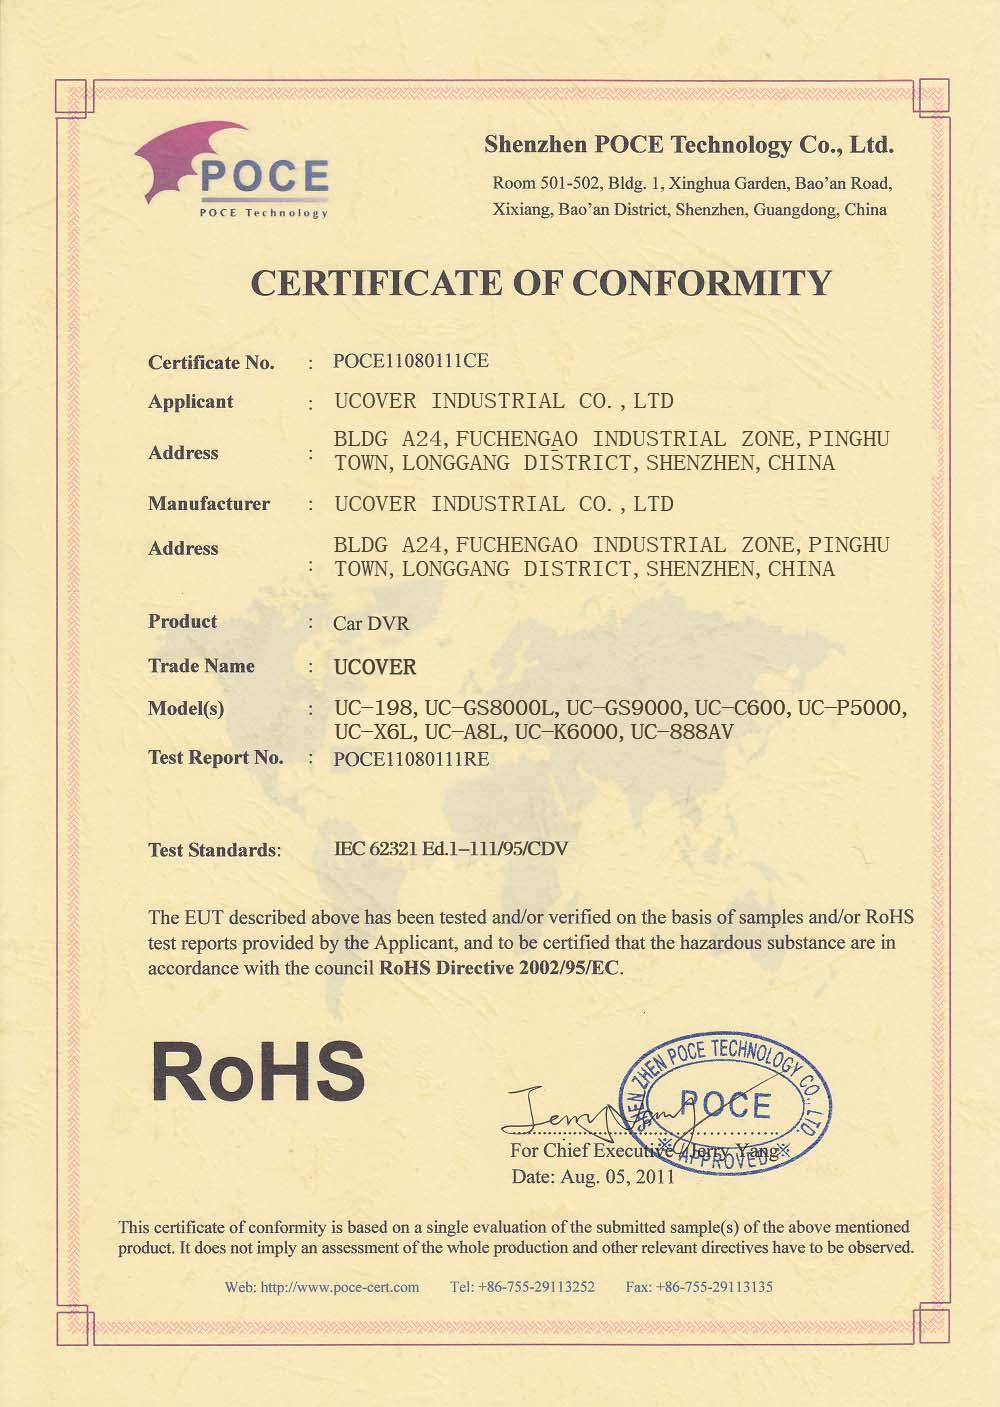 RHOS CERTIFICATION